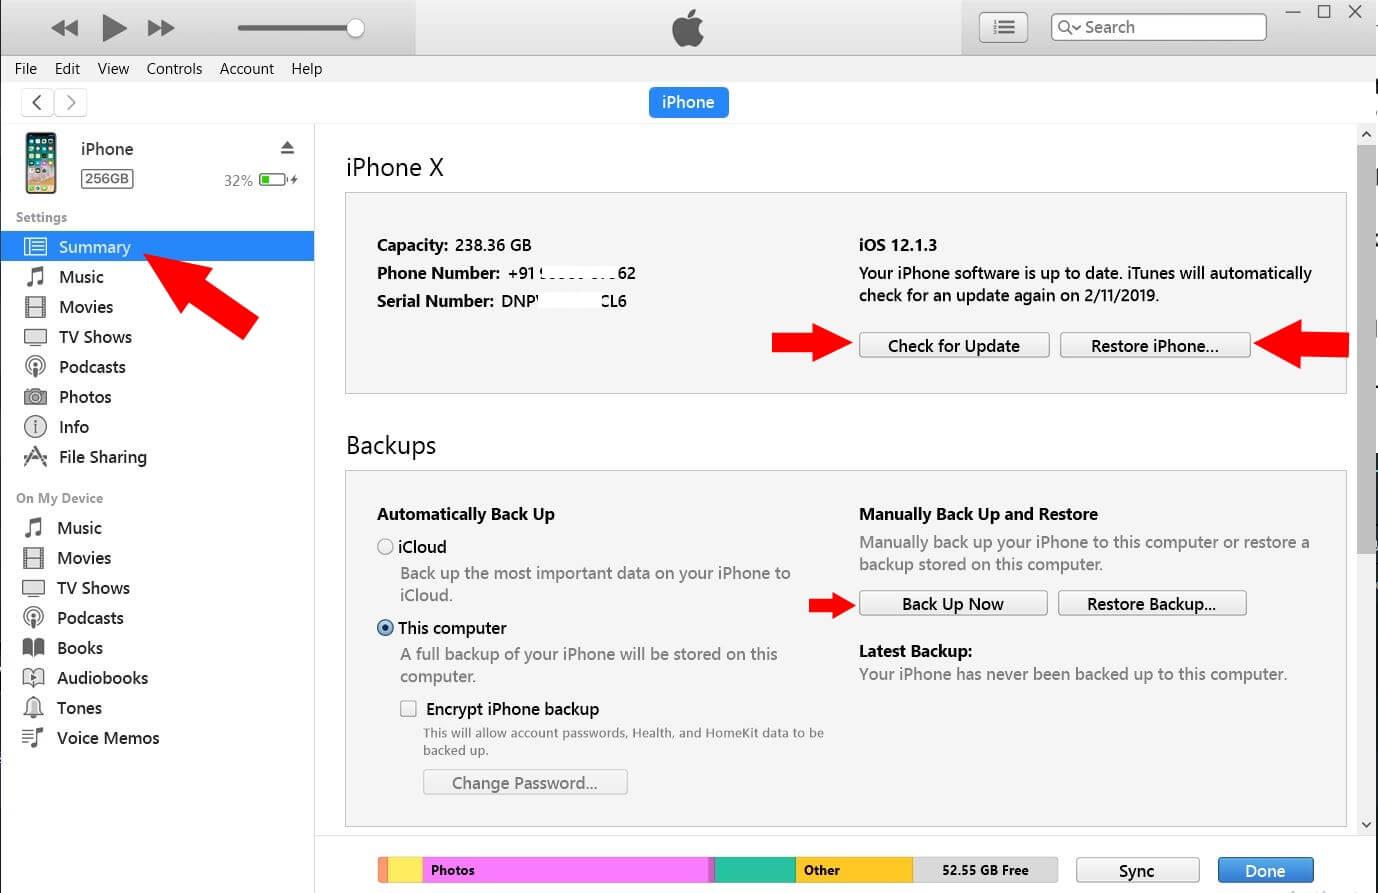 Update iOS on iPhone Using iTunes